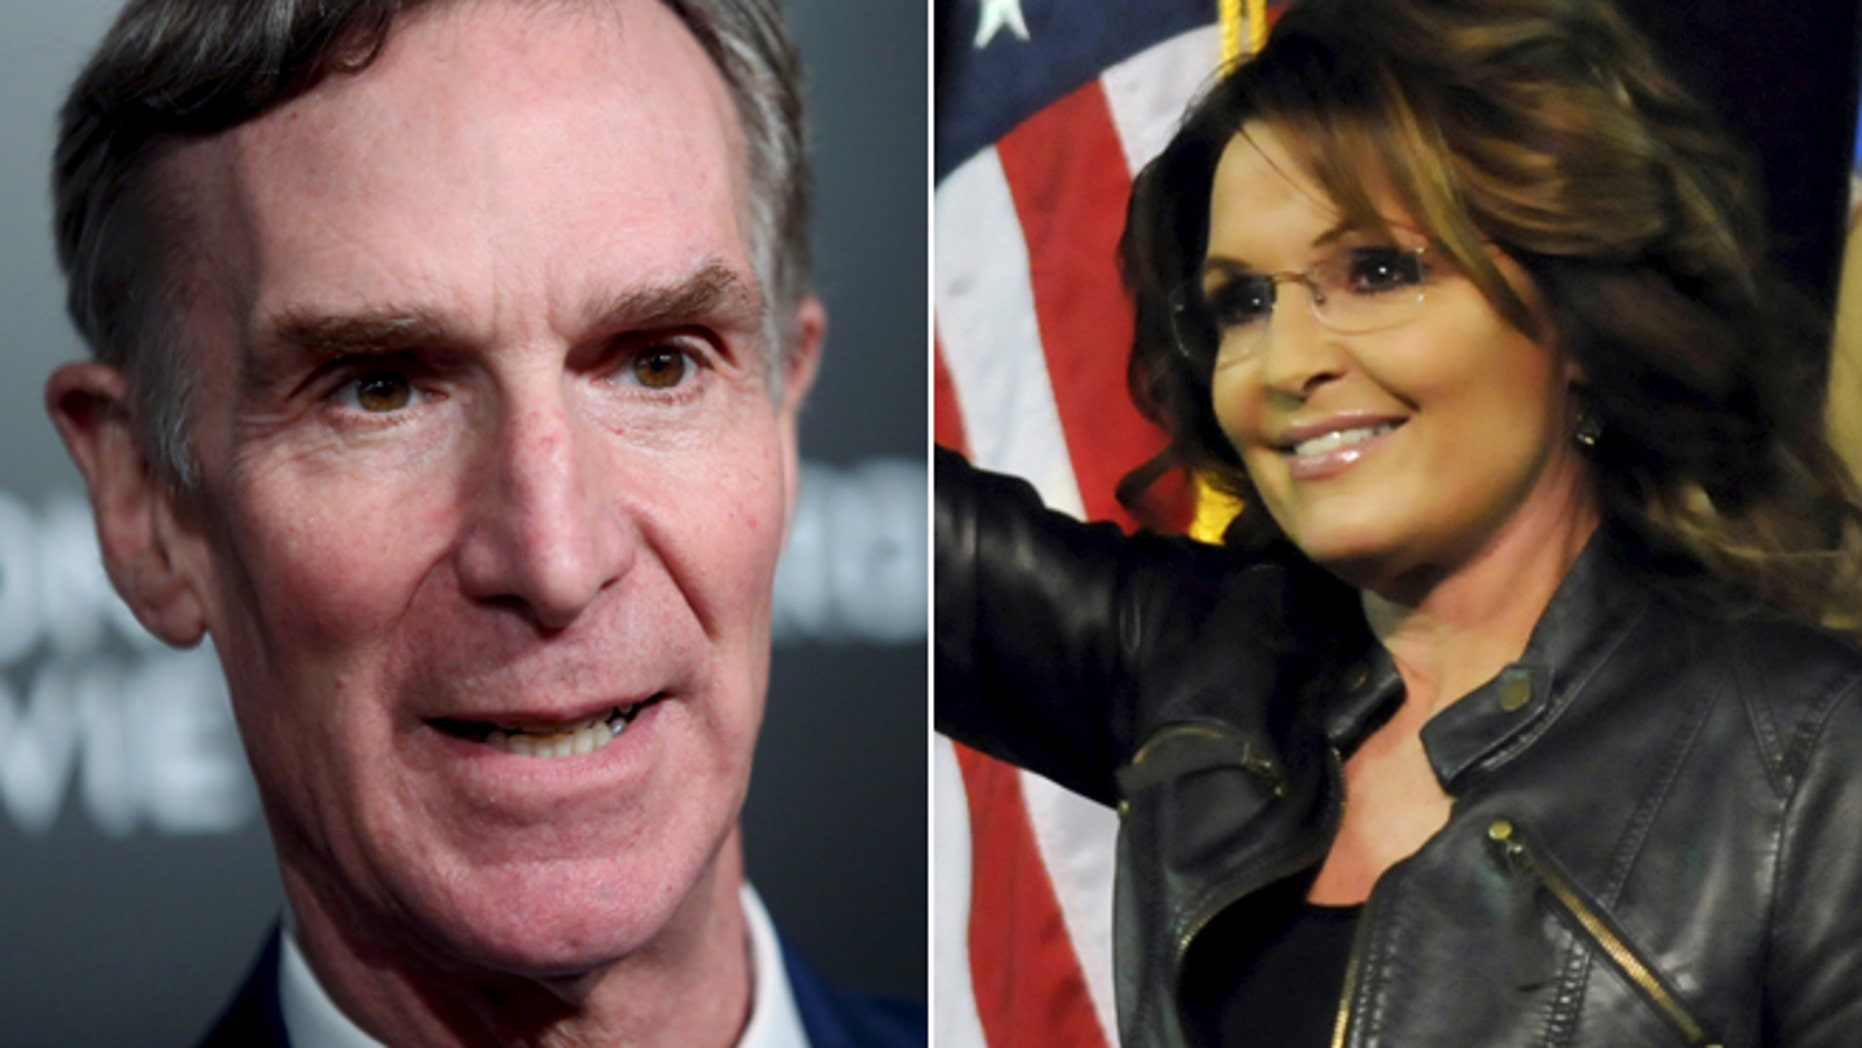 On left, Bill Nye the Science Guy; on right, former Alaska Gov. Sarah Palin